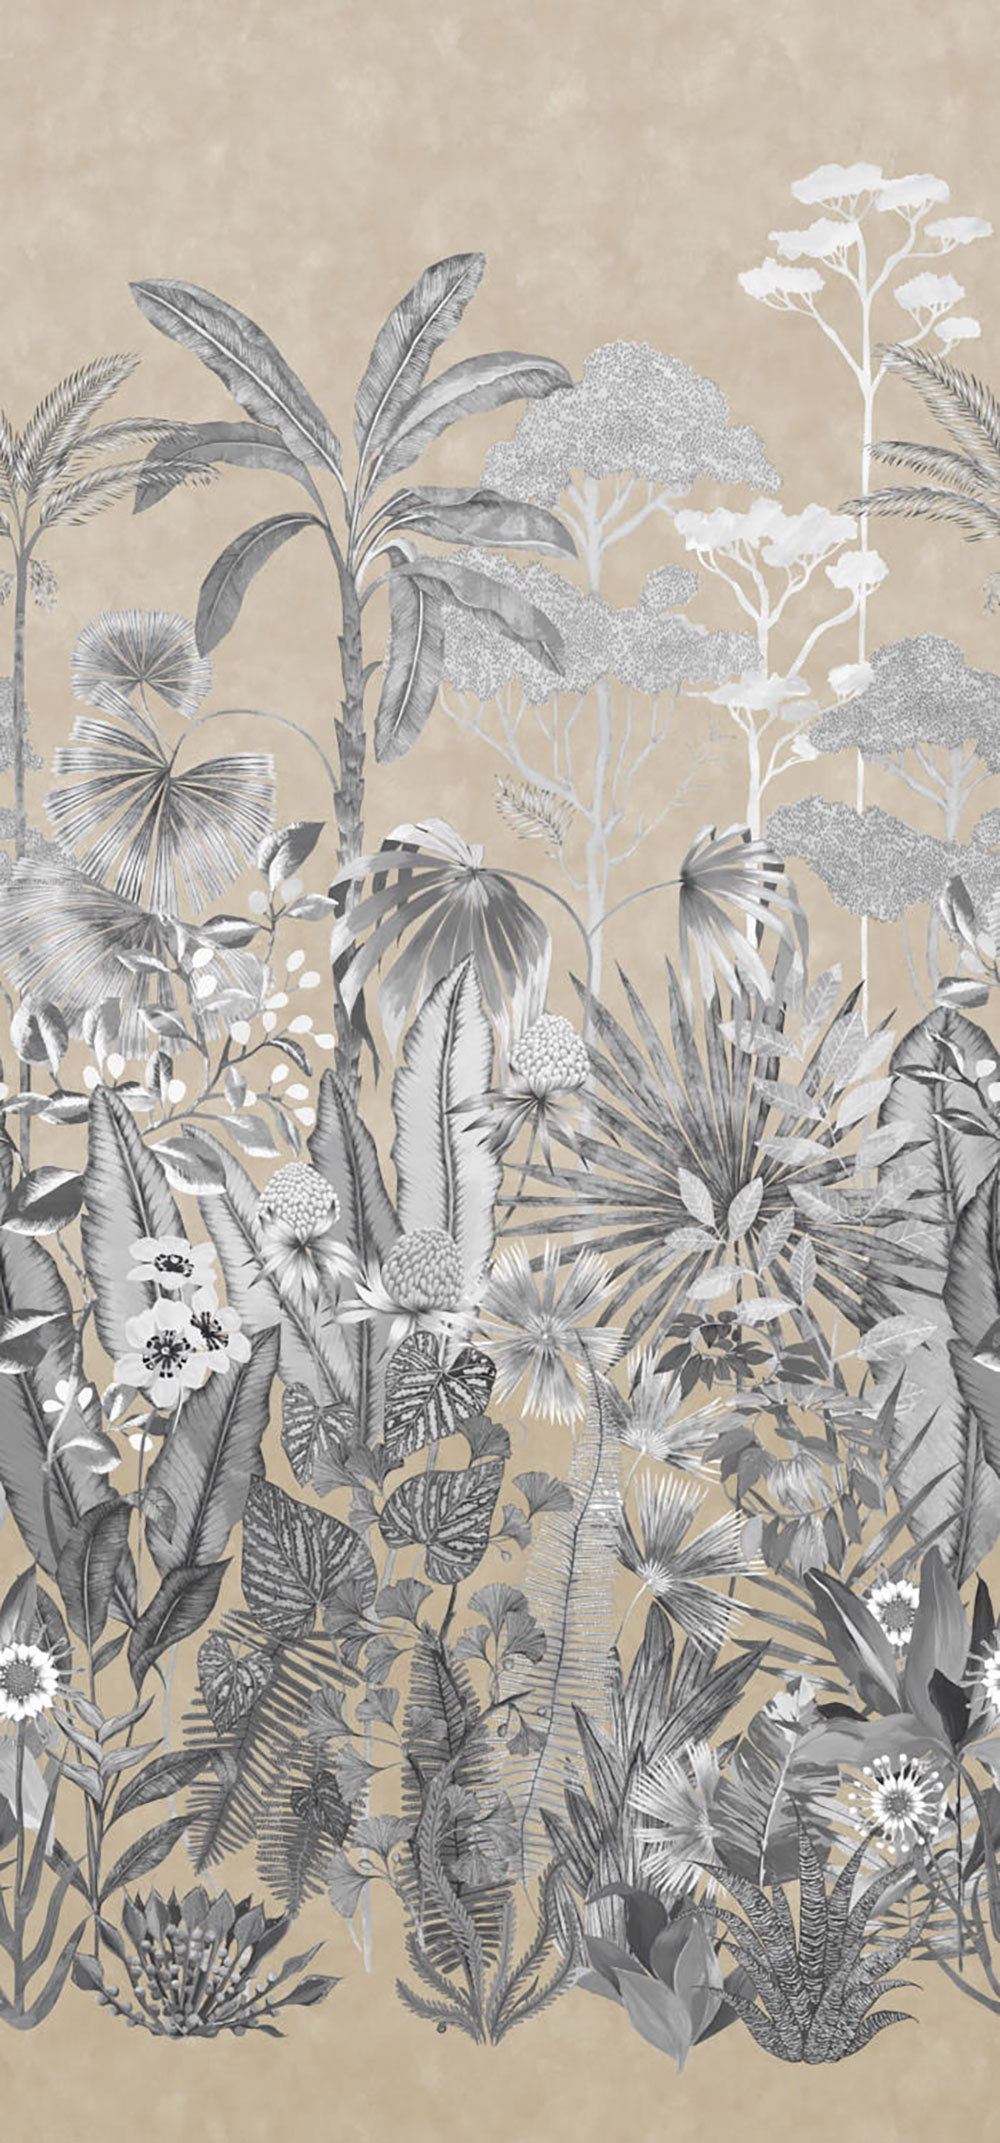 Floreana Mural - Gilt/Black Earth/Tranquility - by Harlequin